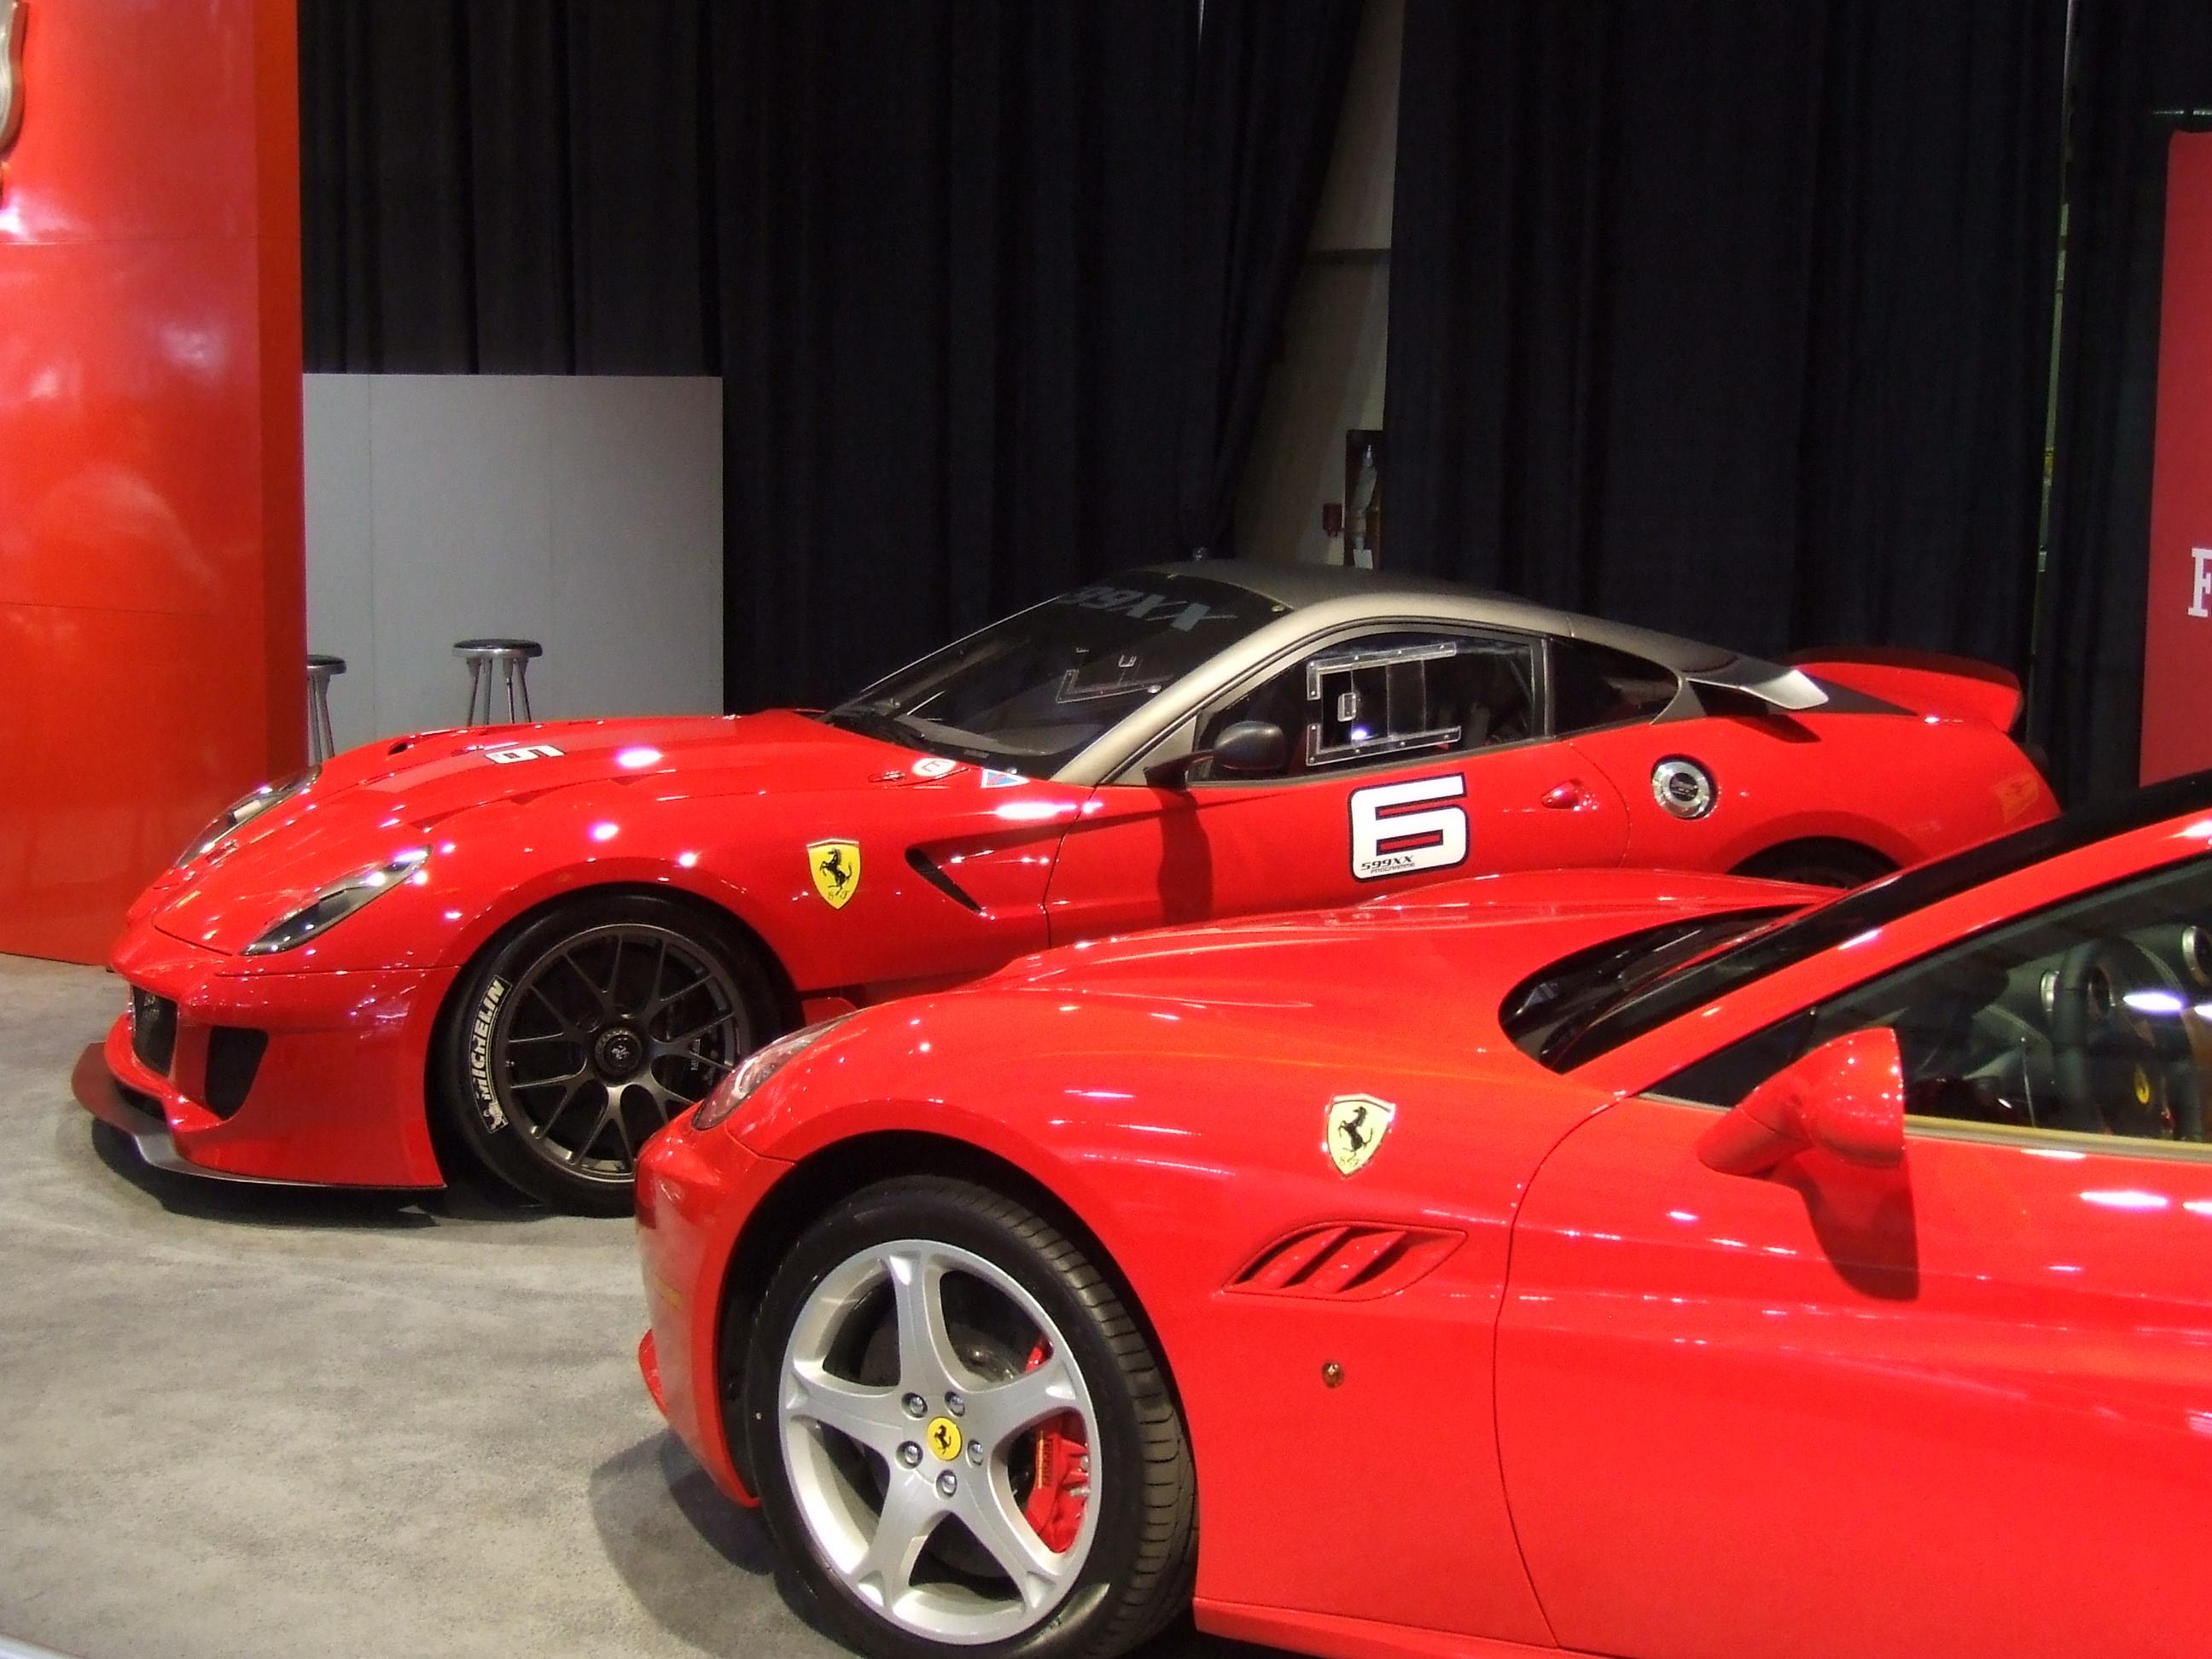 Fileferrari 599xx ciautoshow 2010g wikimedia commons fileferrari 599xx ciautoshow 2010g vanachro Gallery